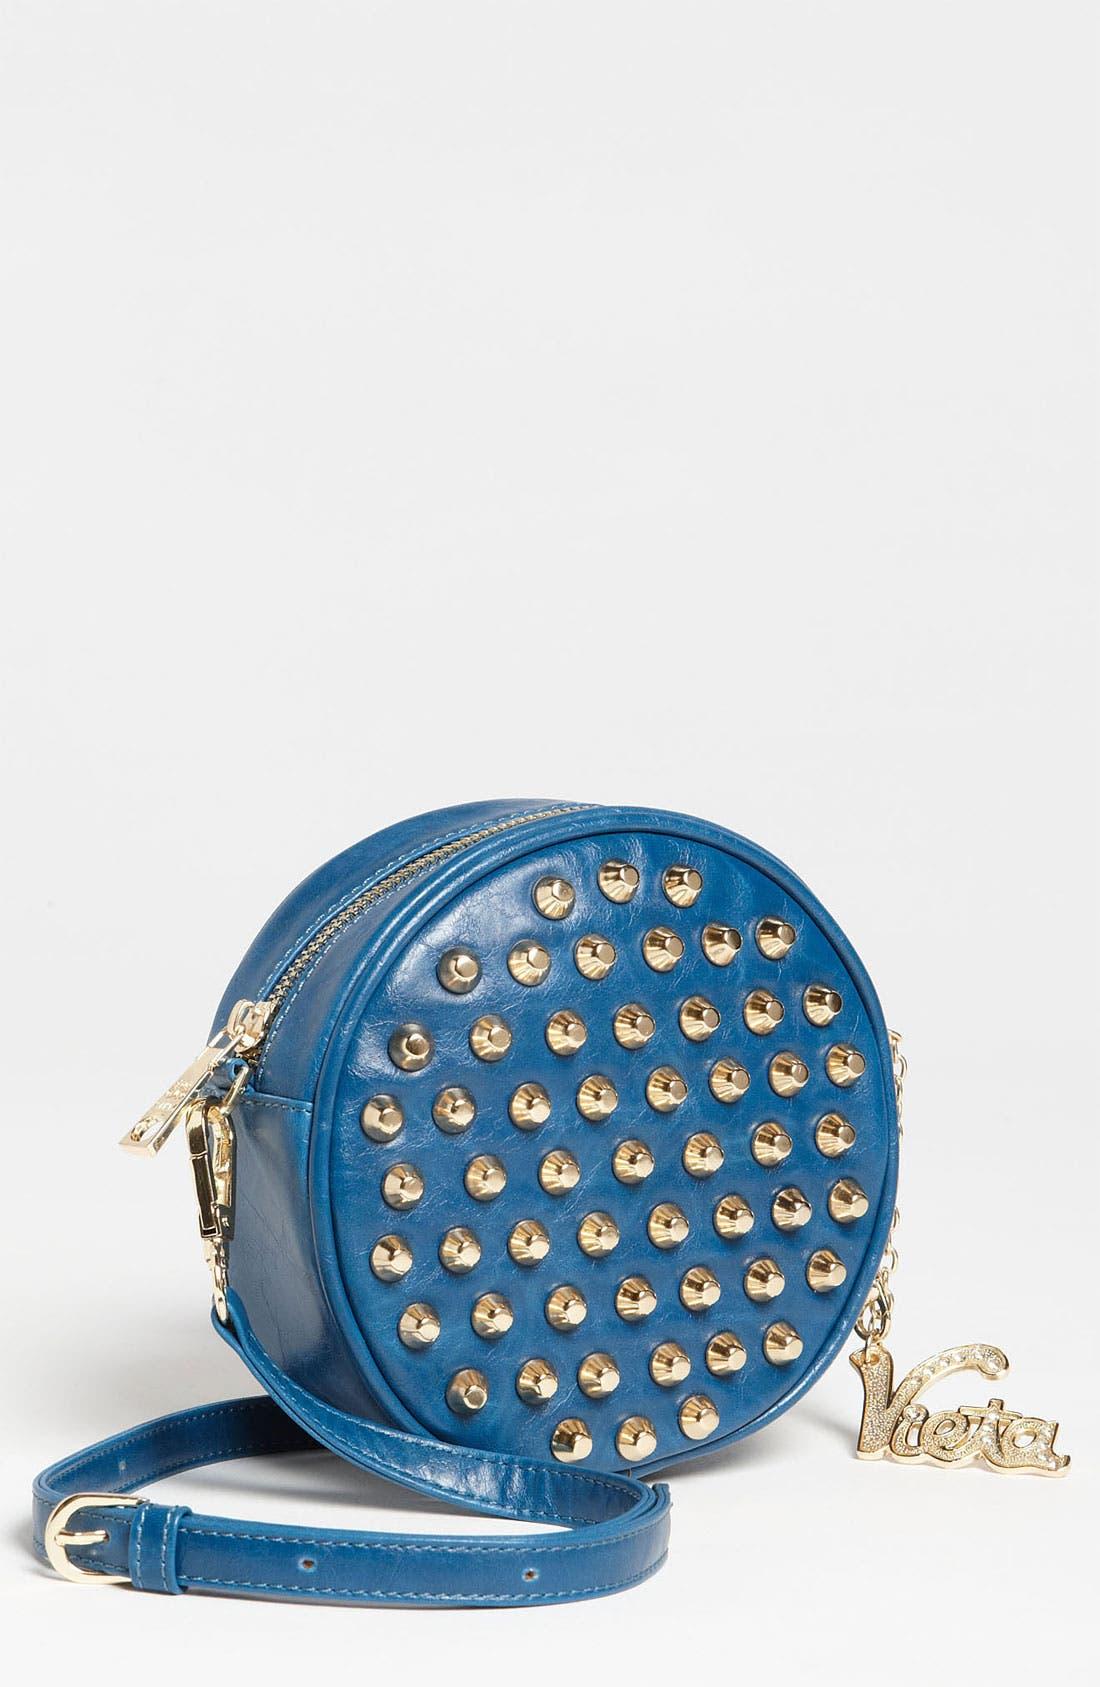 Main Image - Vieta 'Sikey' Crossbody Bag